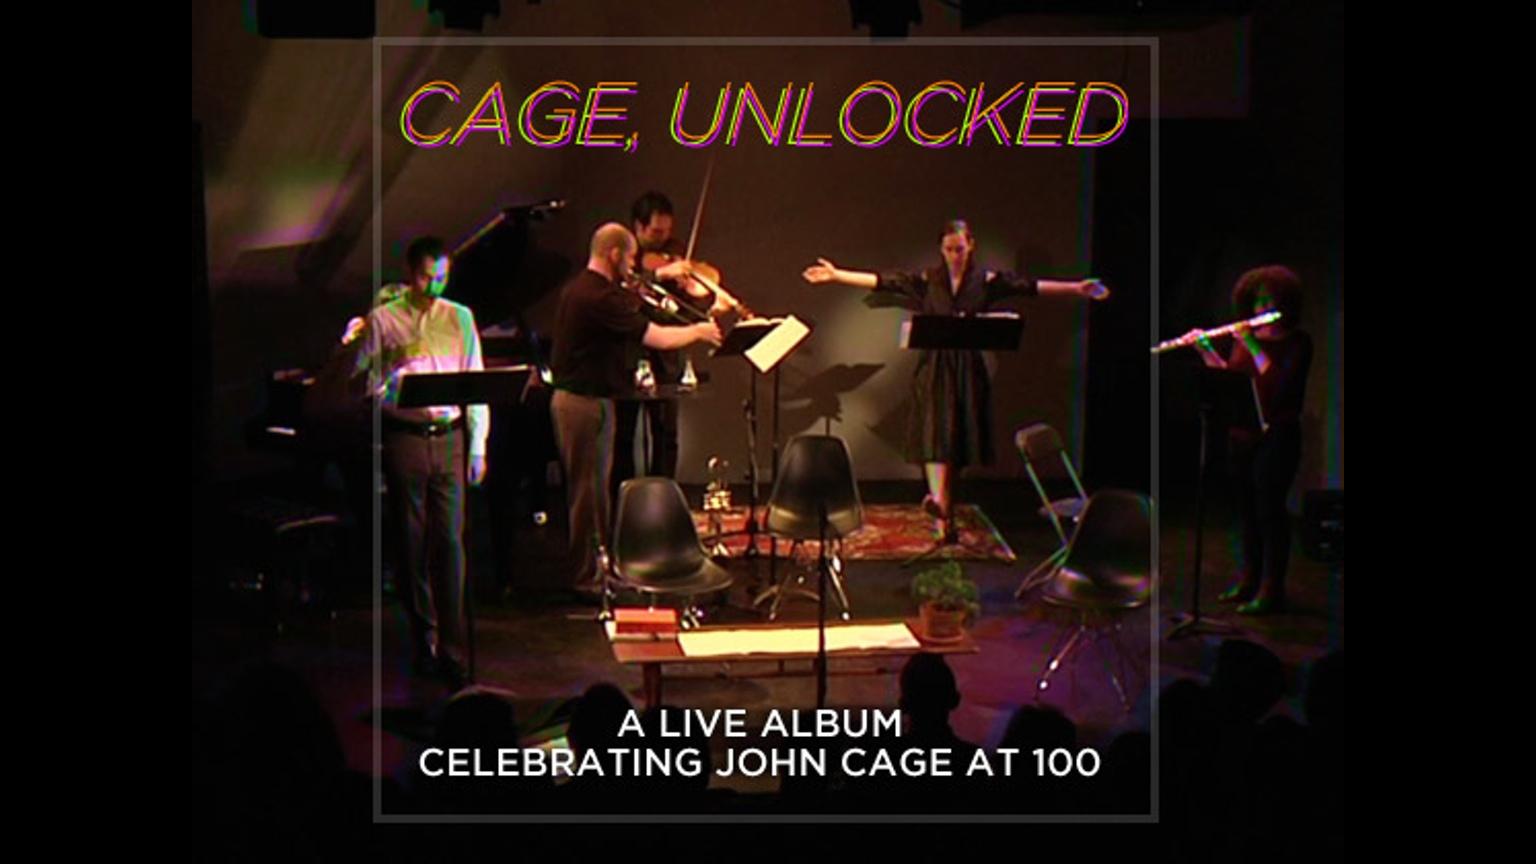 Cage, Unlocked Kickstarter Image